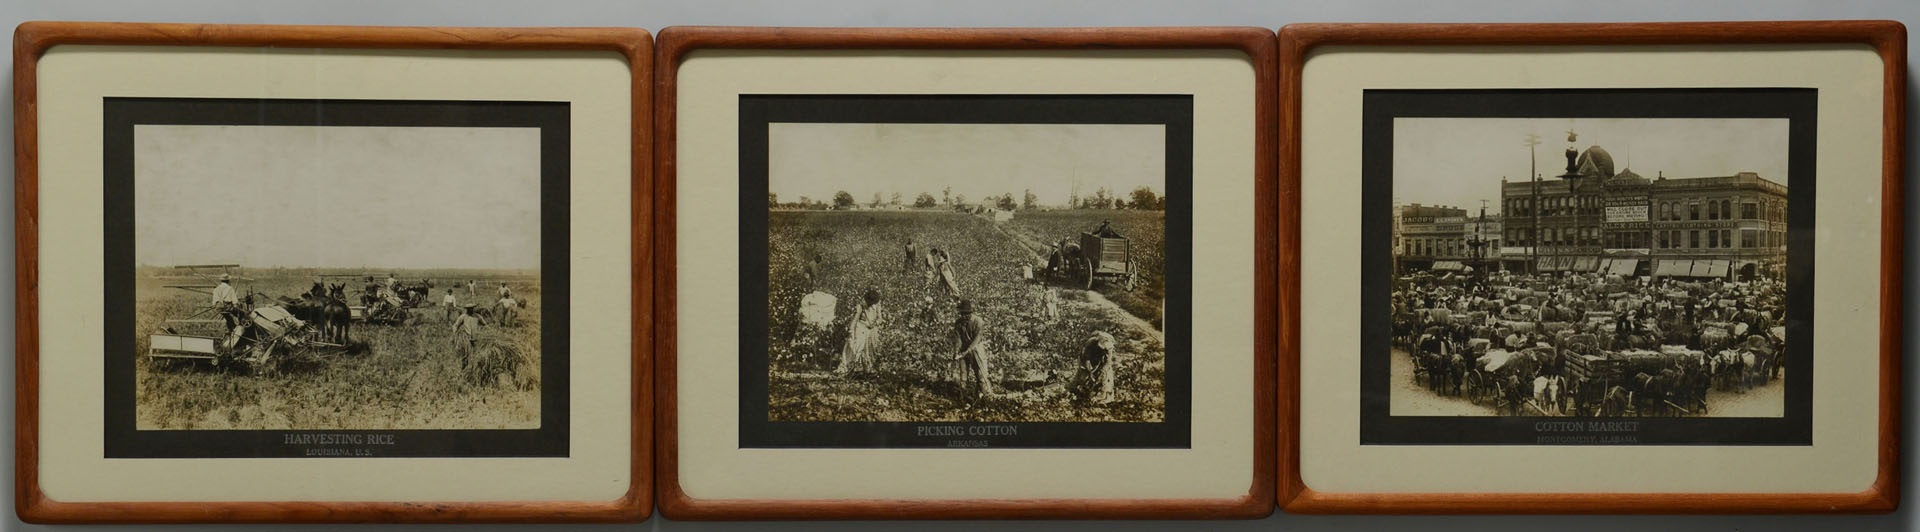 Lot 49: 3 Albumen Prints, Southern Interest, early 20th c.